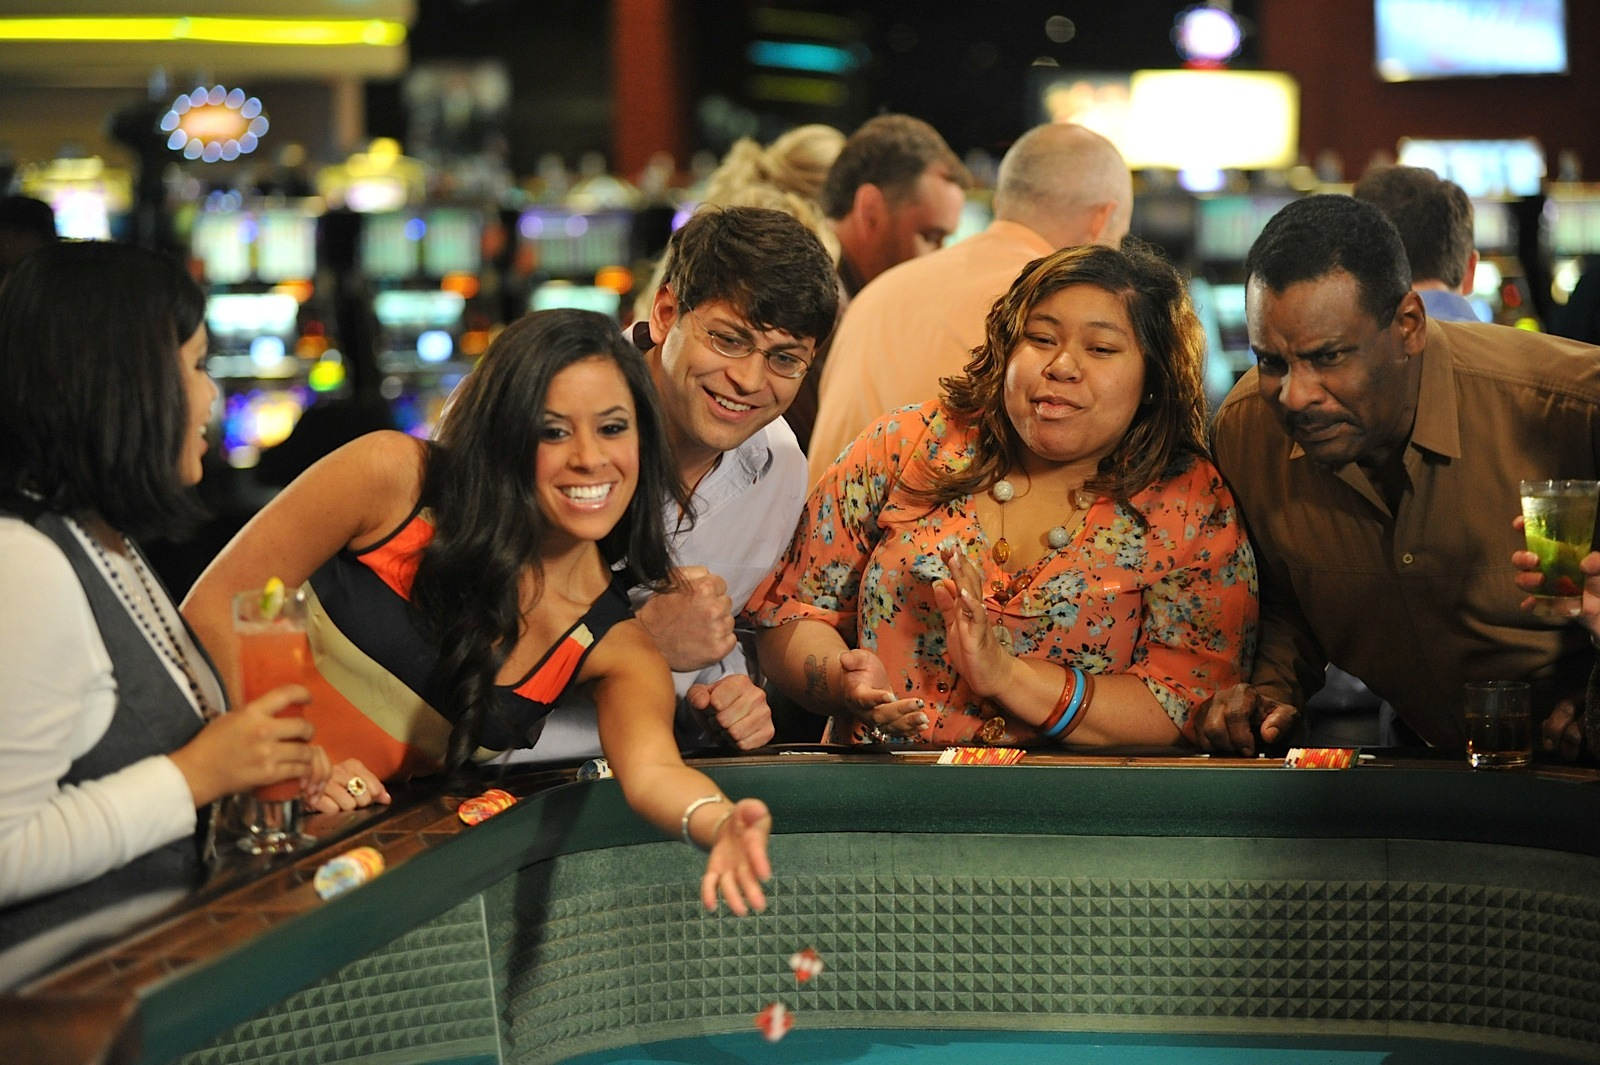 Enjoy playing casino games in online